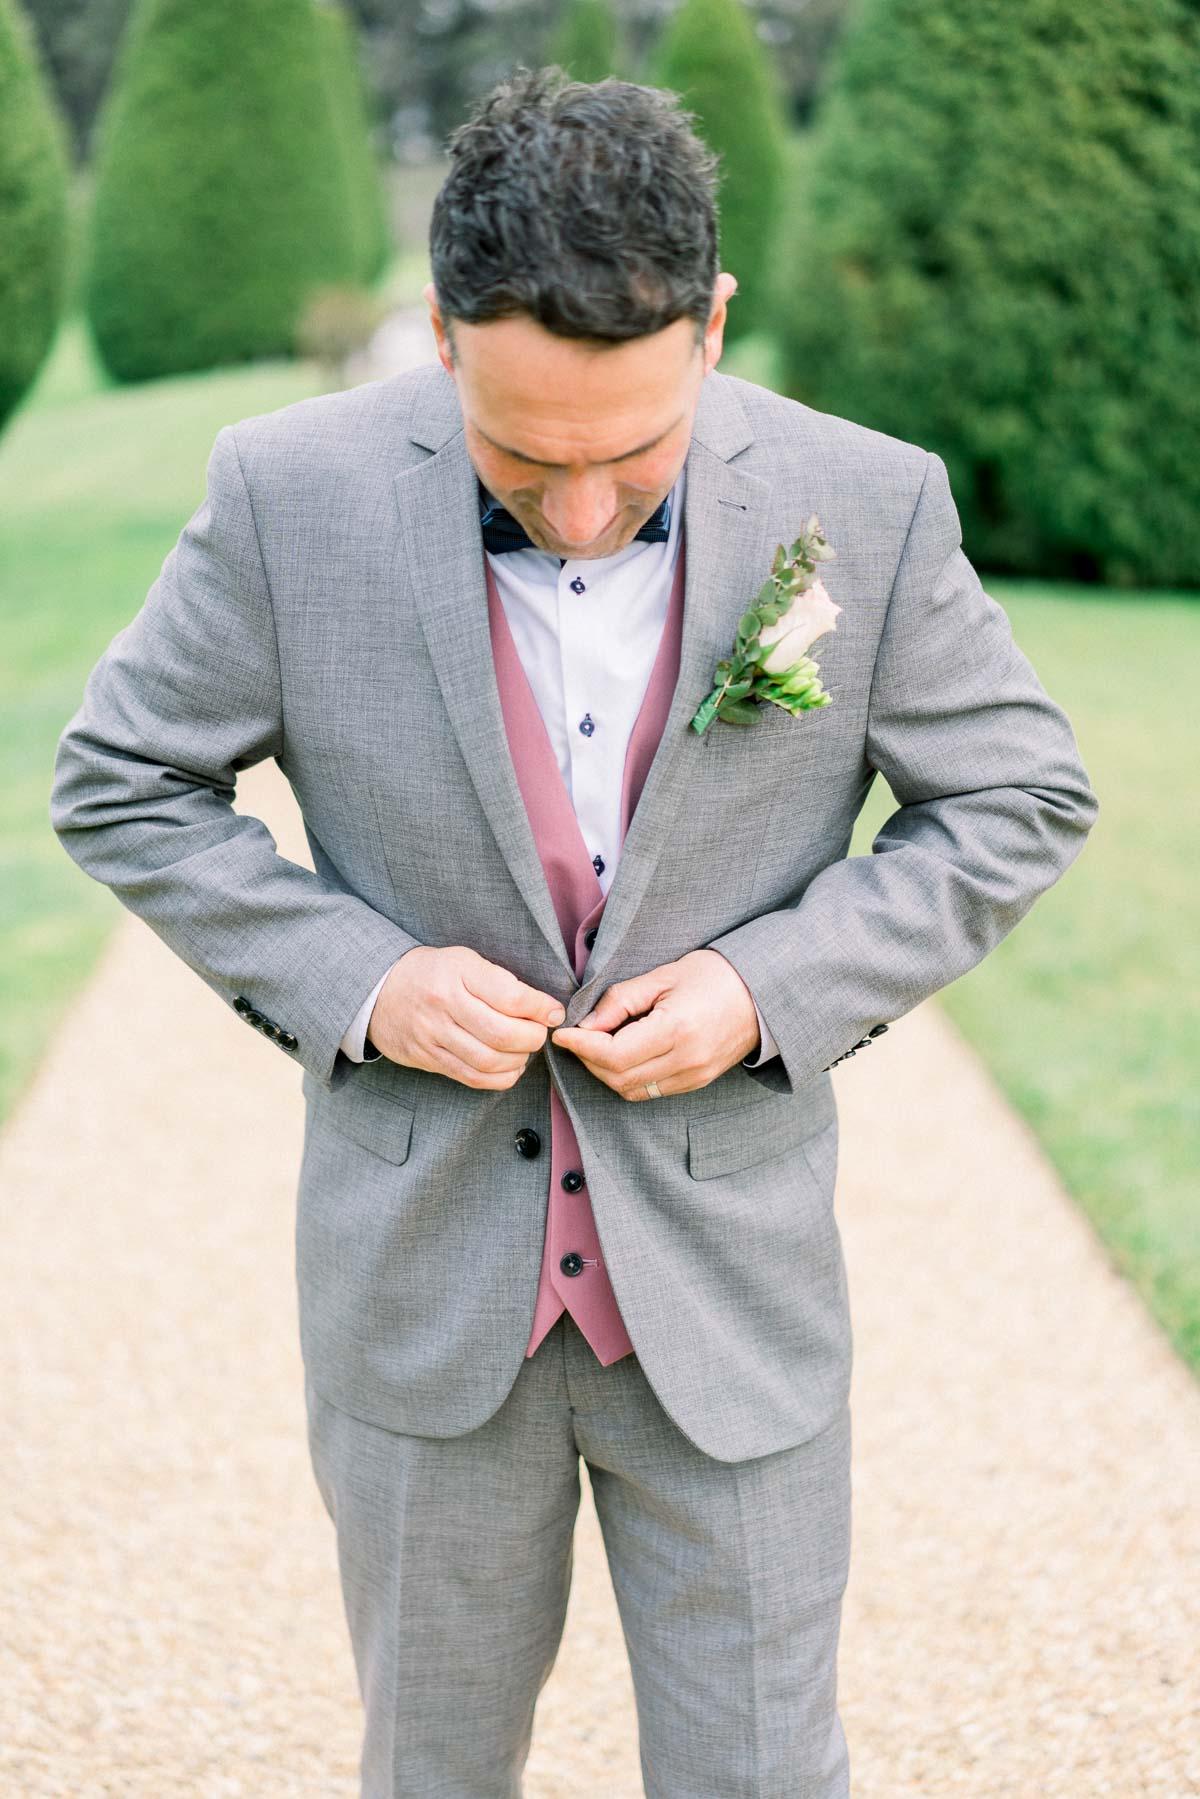 lindenderry-wedding-heart+soul-weddings-amy-alain-03662.jpg